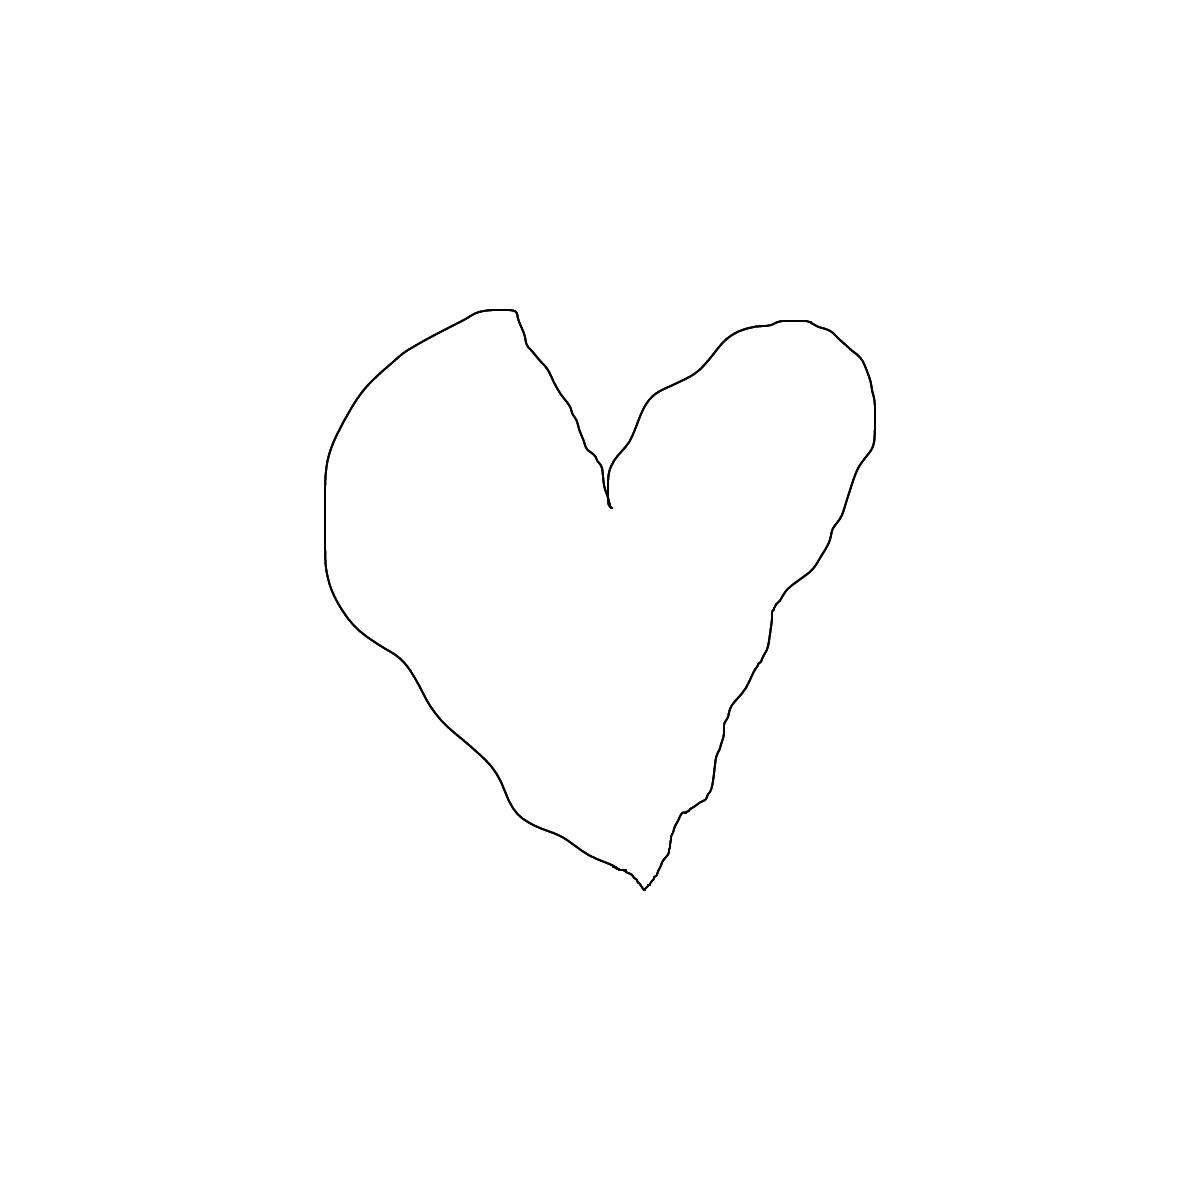 BAAAM drawing#11192 lat:17.4101619720459000lng: 78.4747924804687500